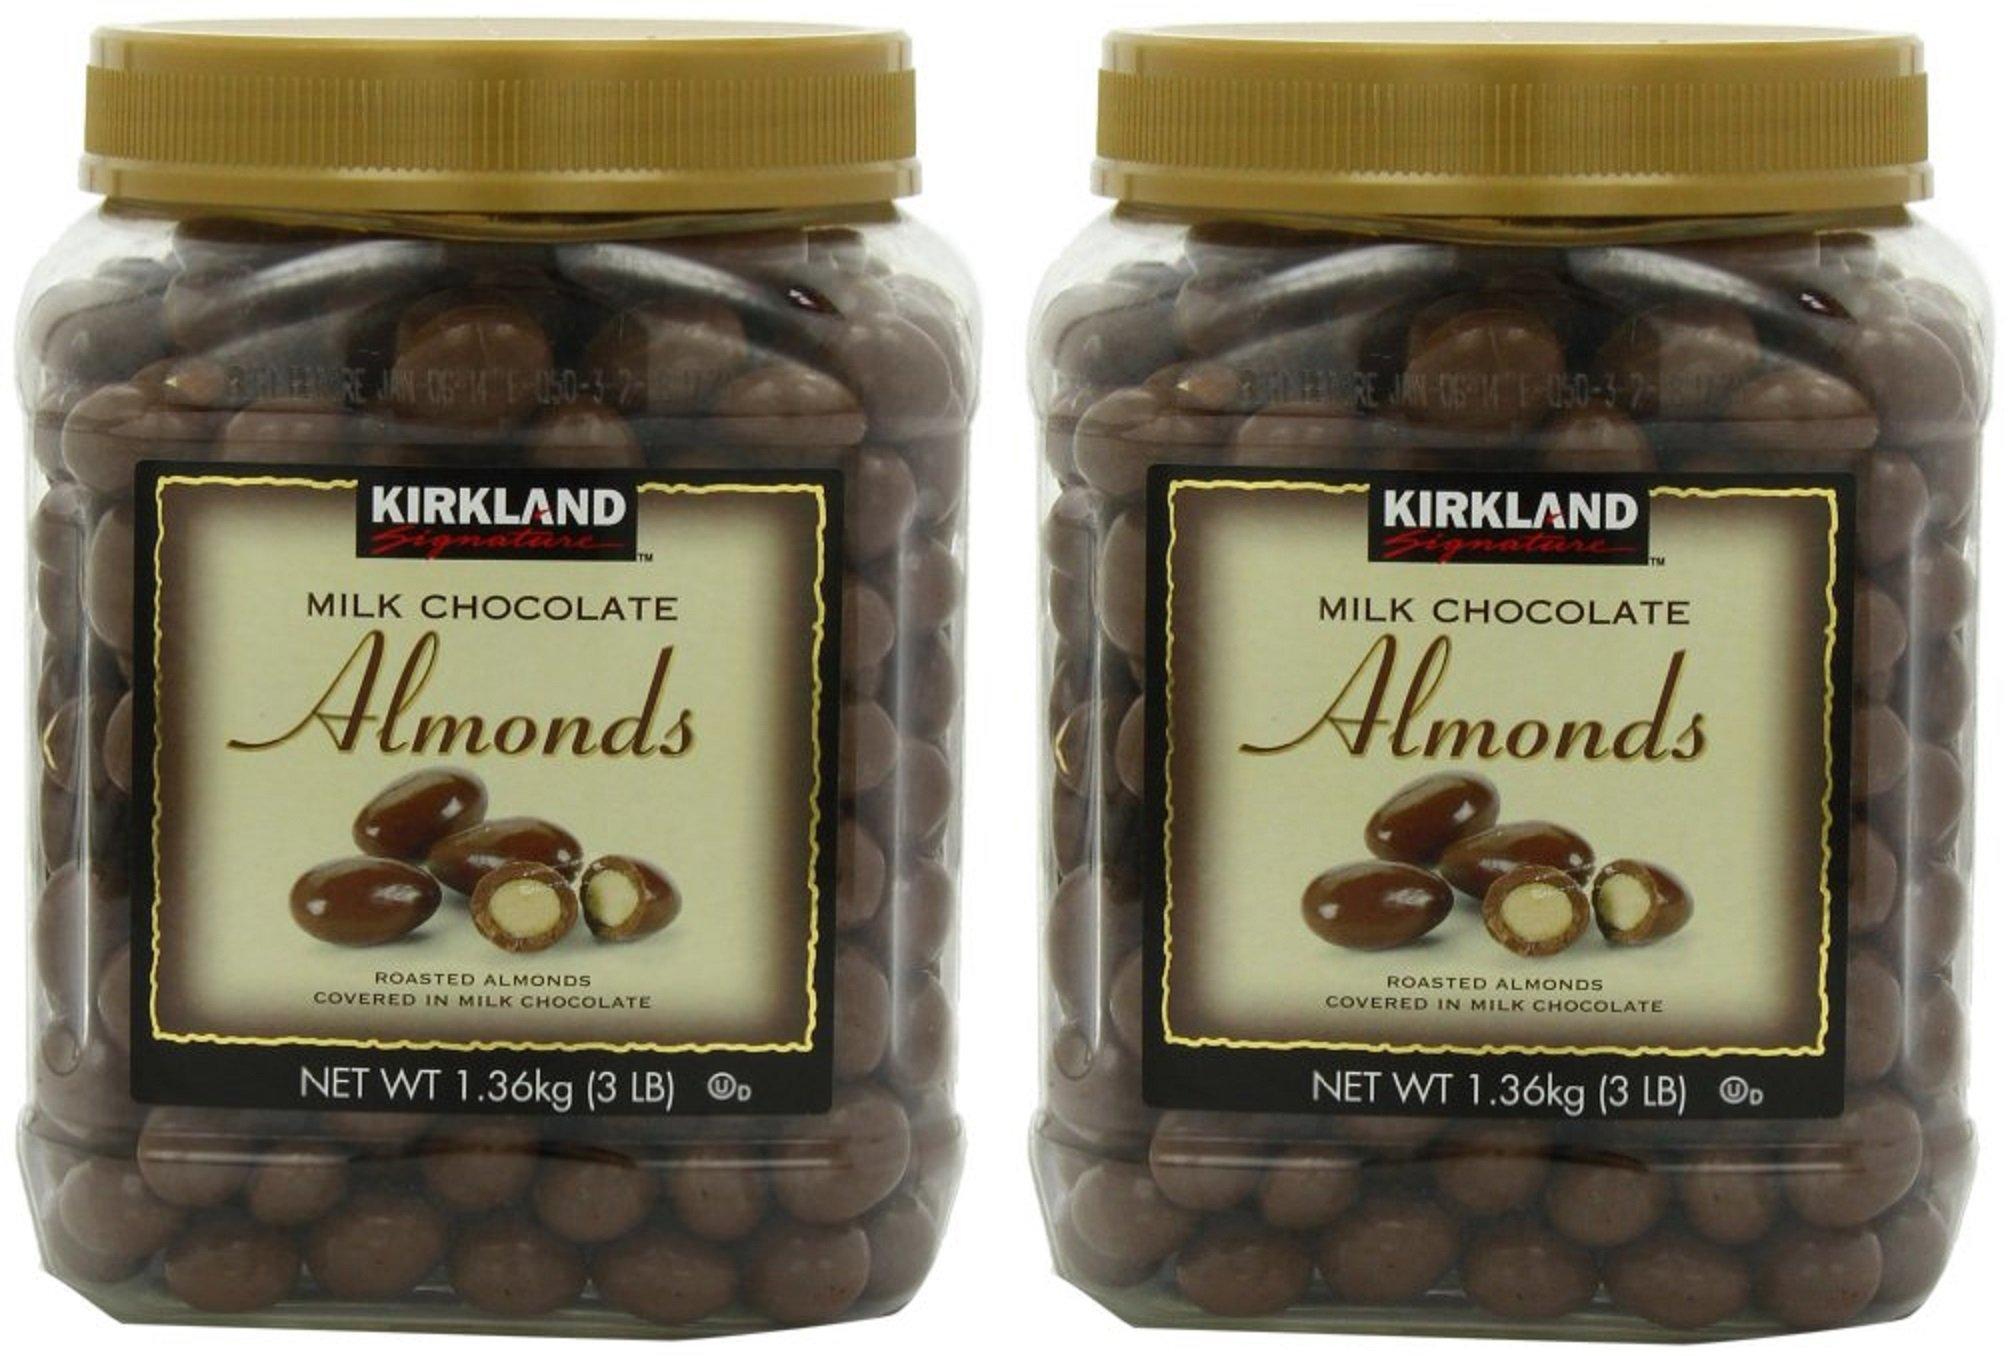 Signatures Milk Chocolate, Almonds, 48 Ounce wMynJH, 2Pack (48 Ounce)